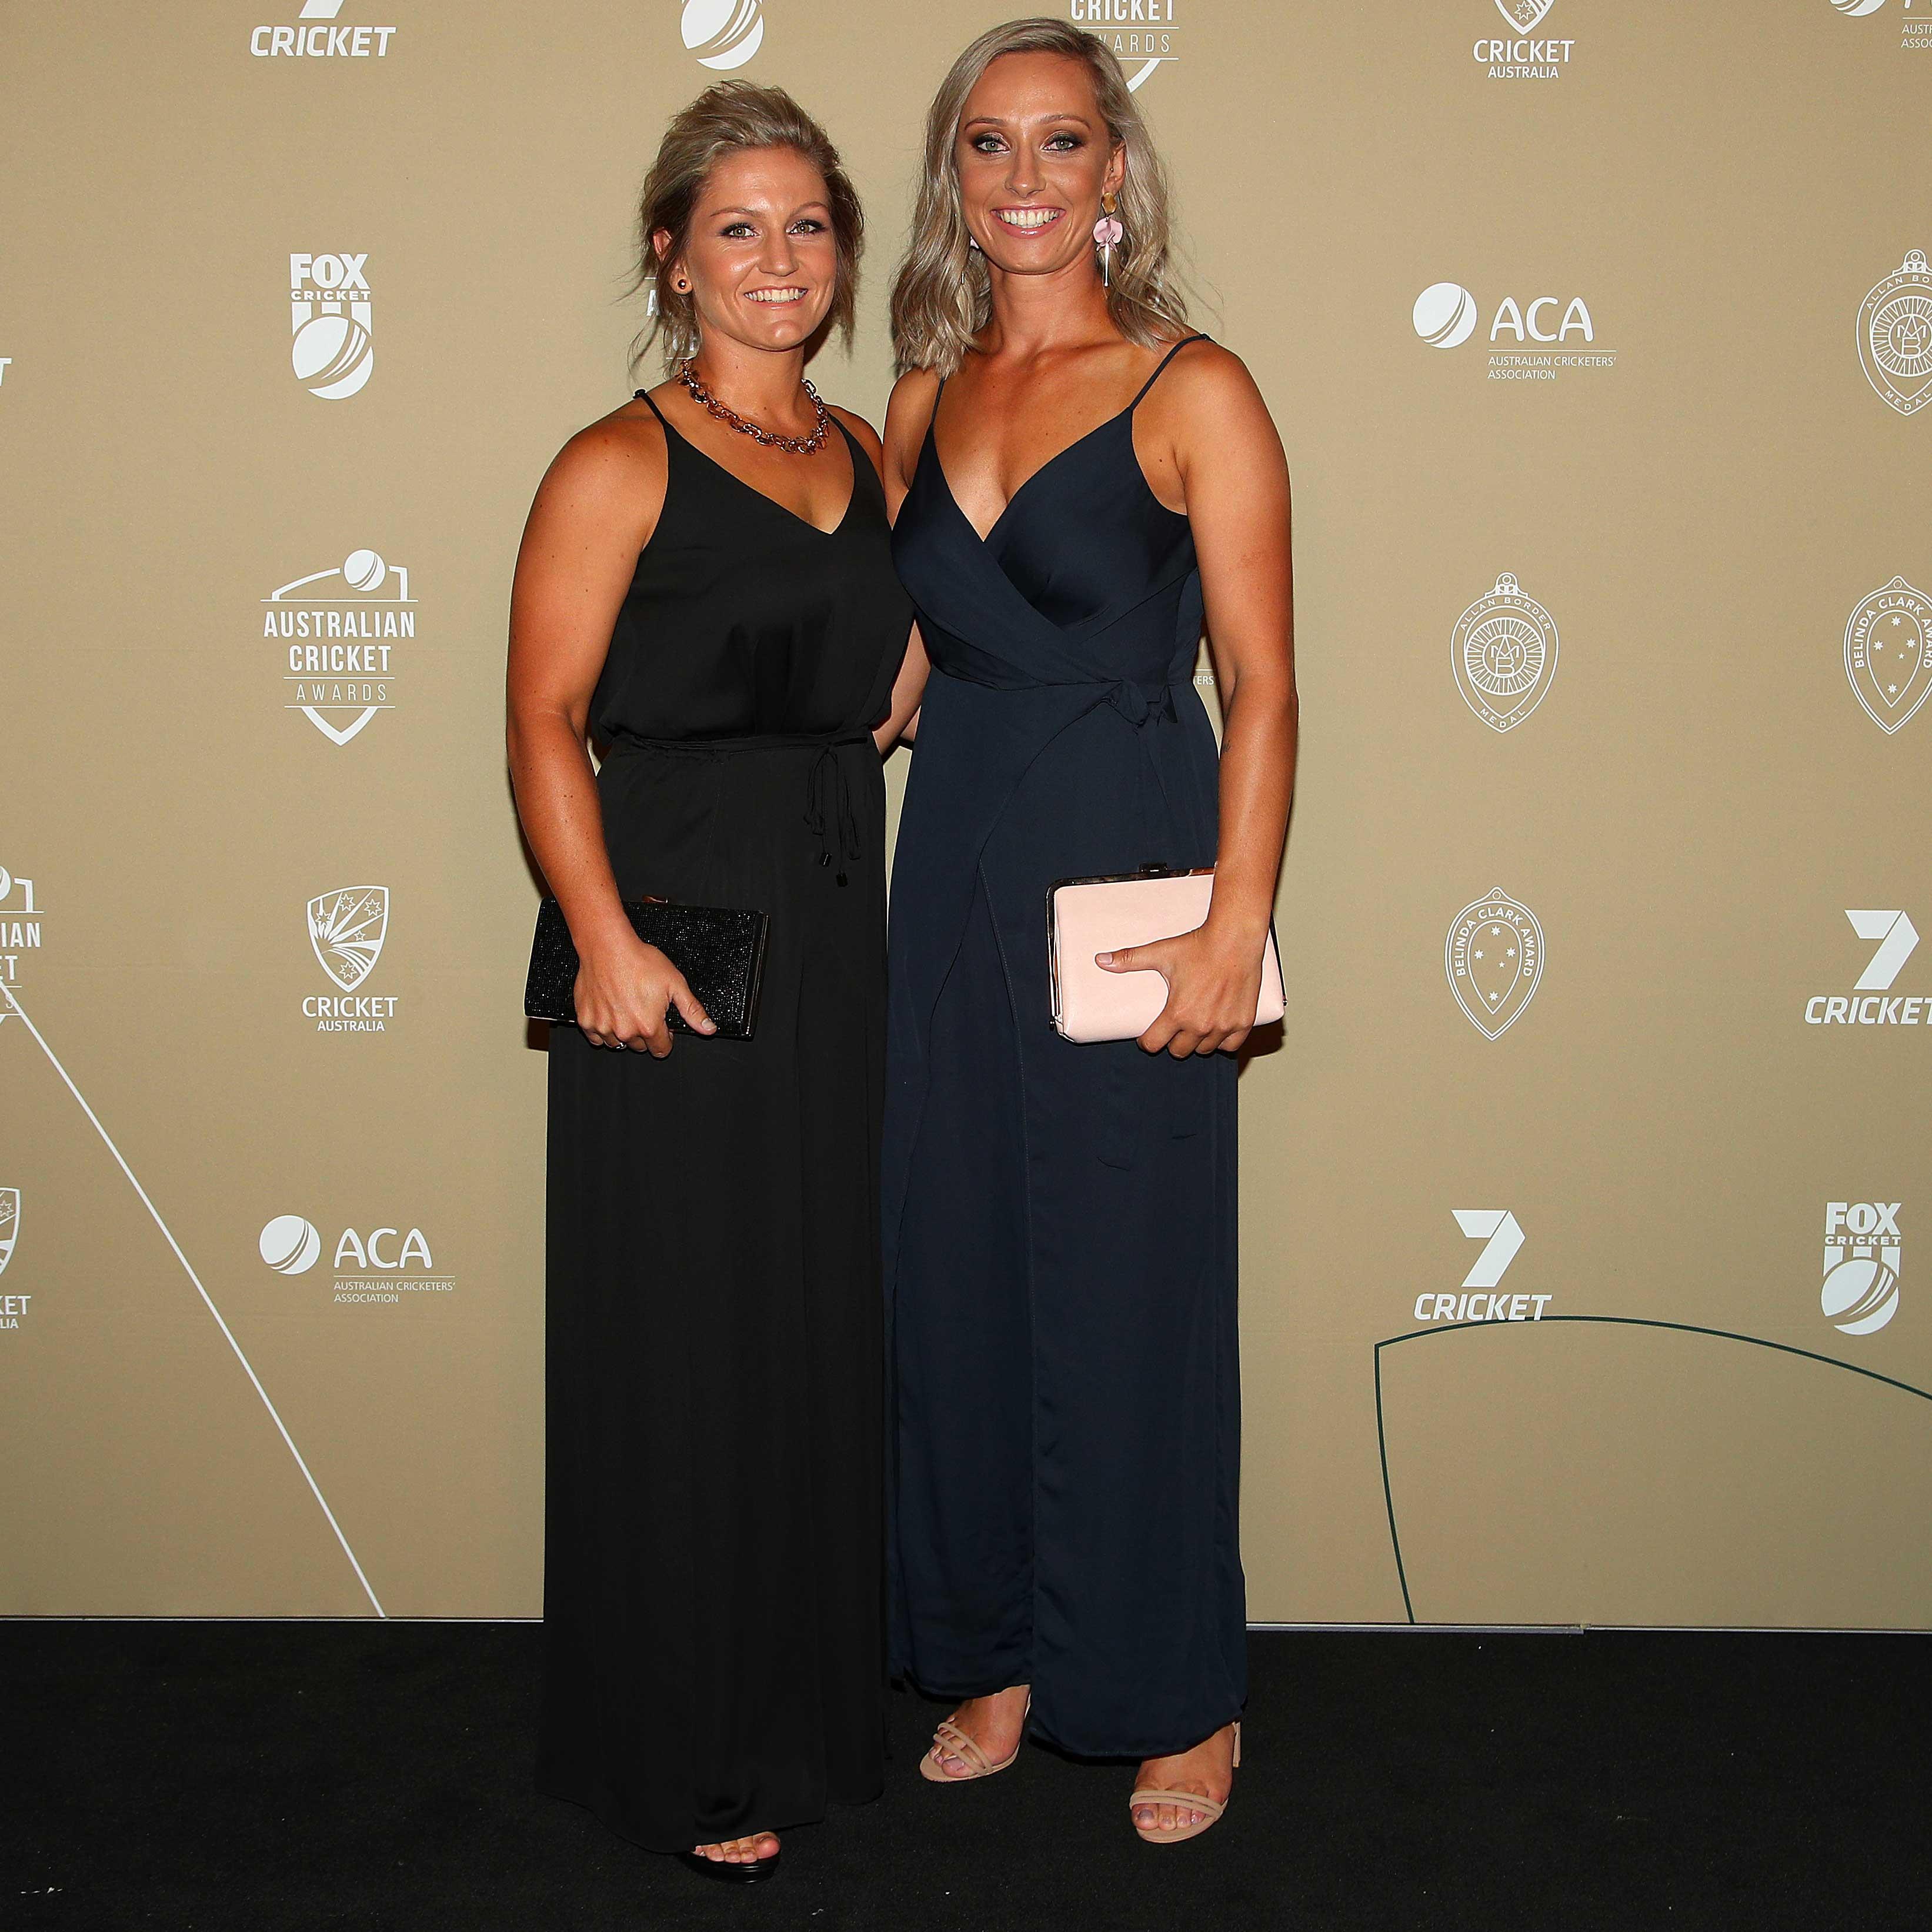 Ashleigh Gardner (right) and partner Bridget Patterson // Getty